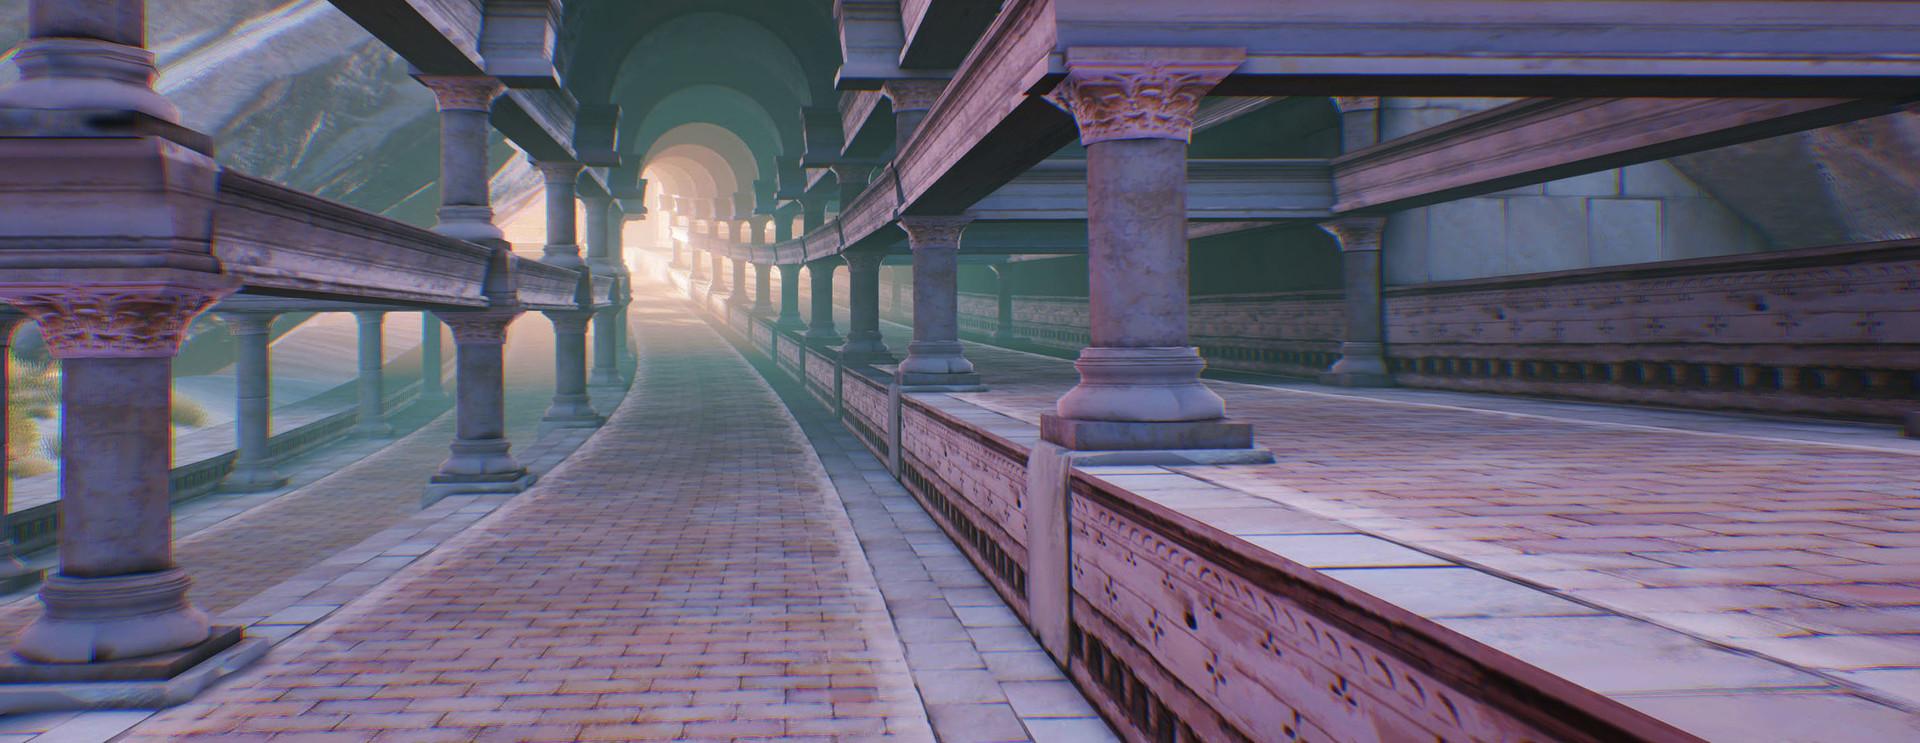 Florian thomasset desert temple 11